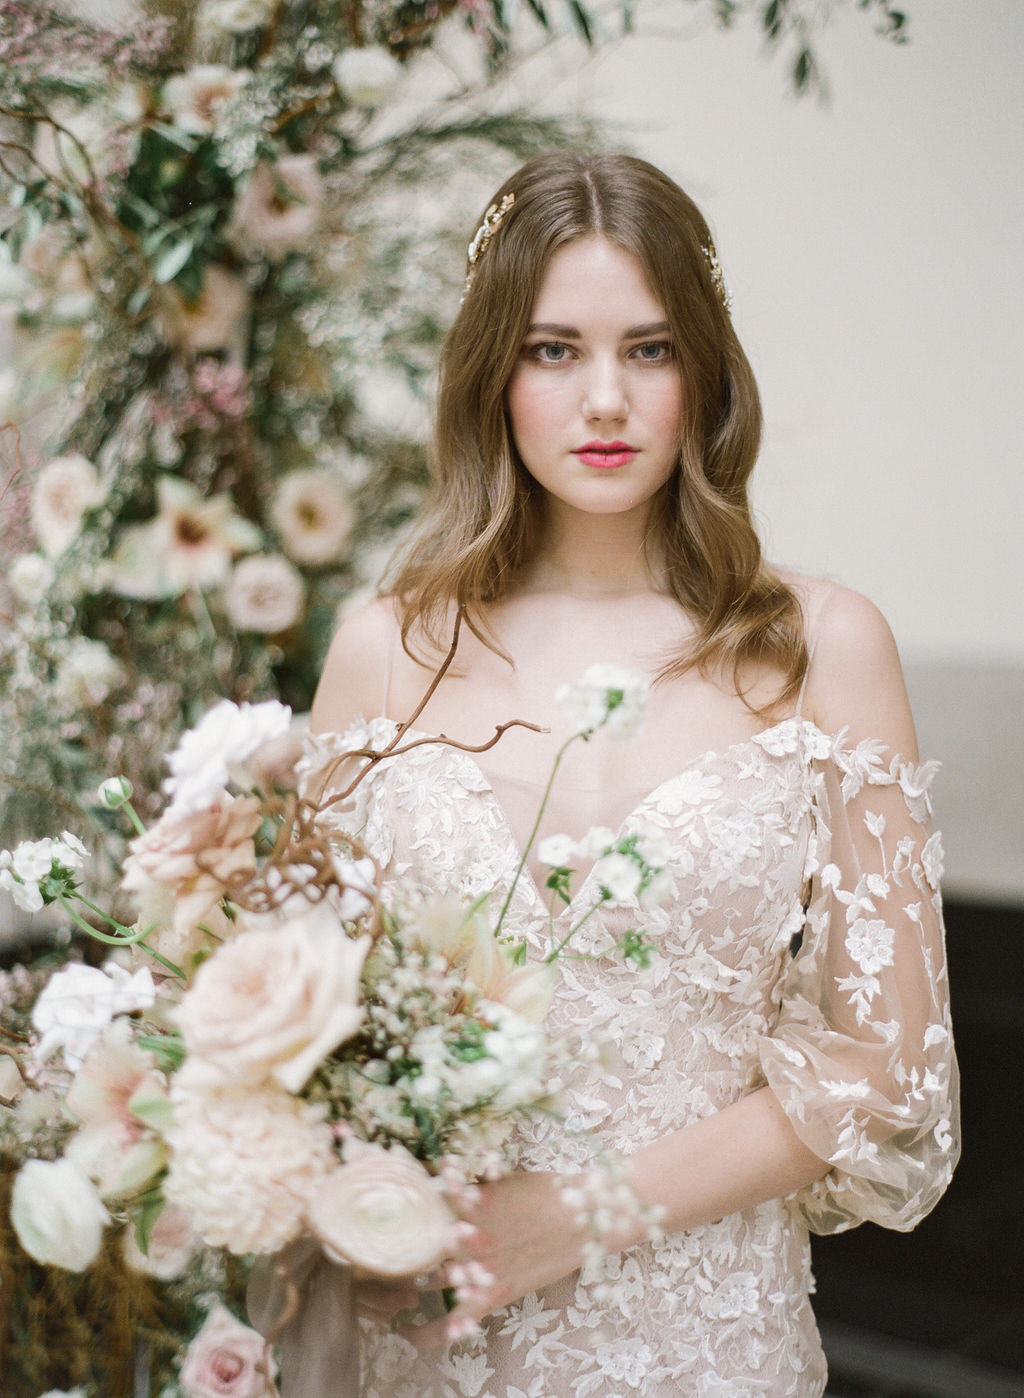 artiese-ago-wedding-editorial-000423690010.jpg